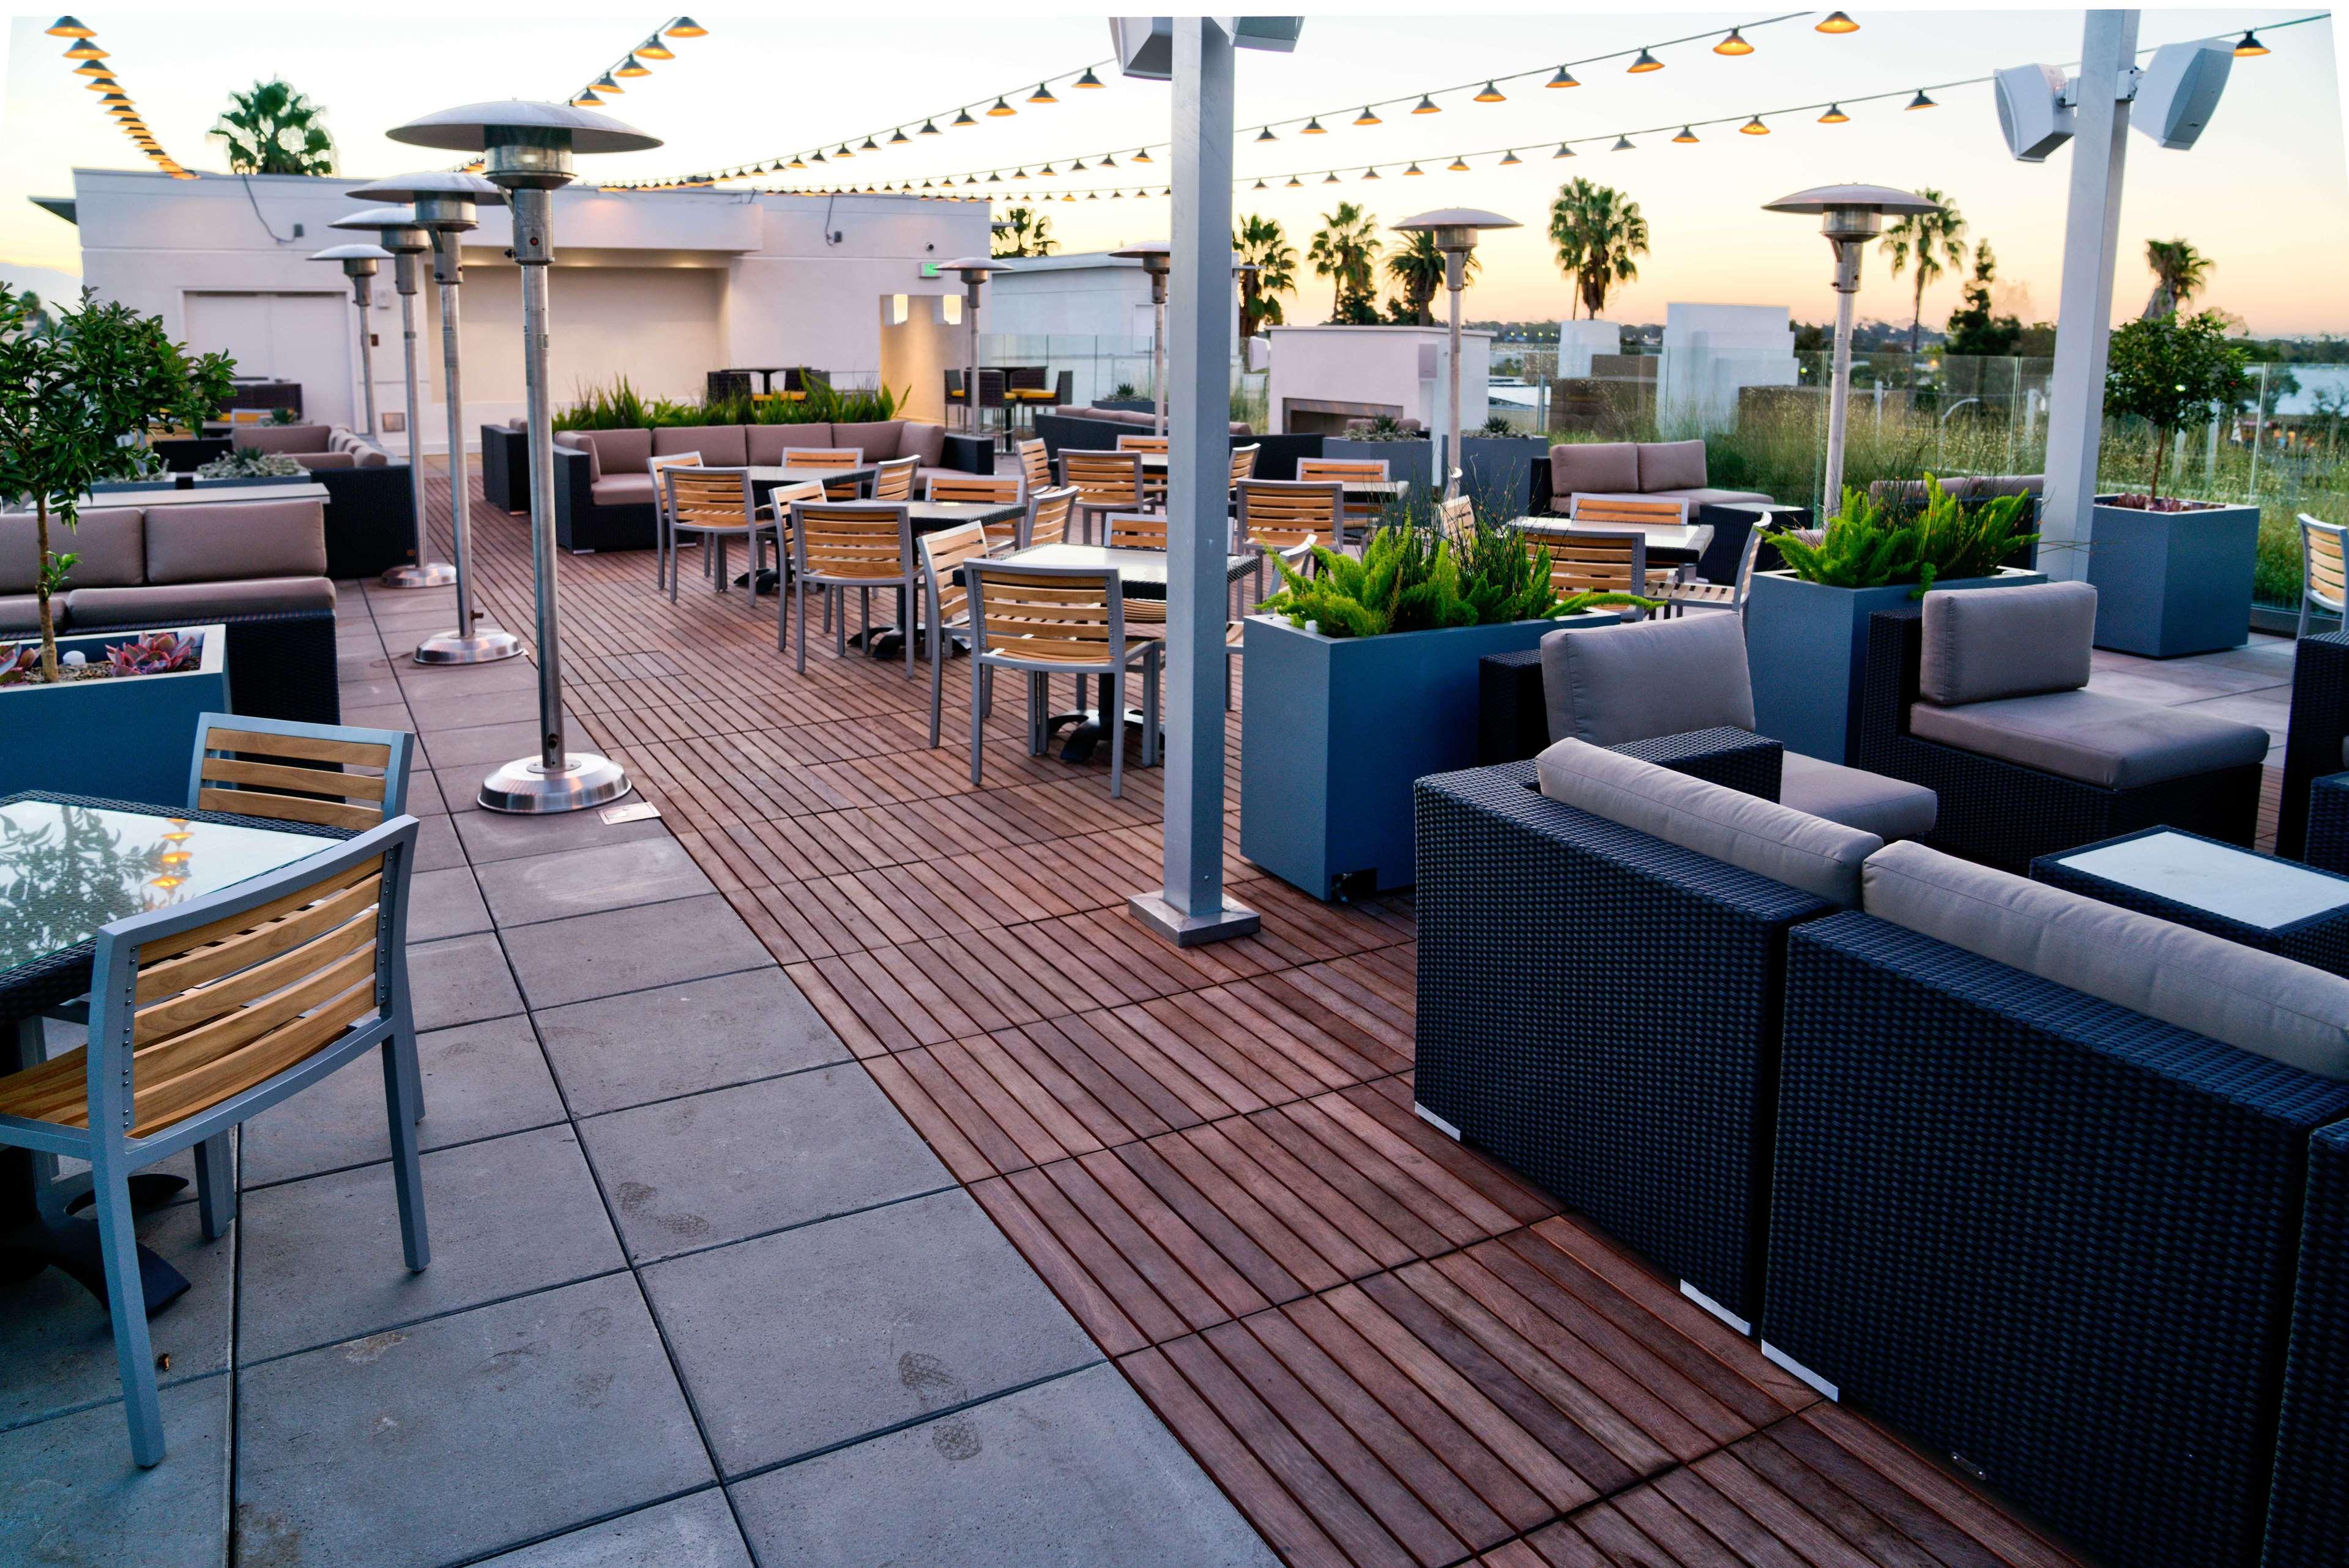 Hilton Garden Inn Santa Barbara/Goleta image 1